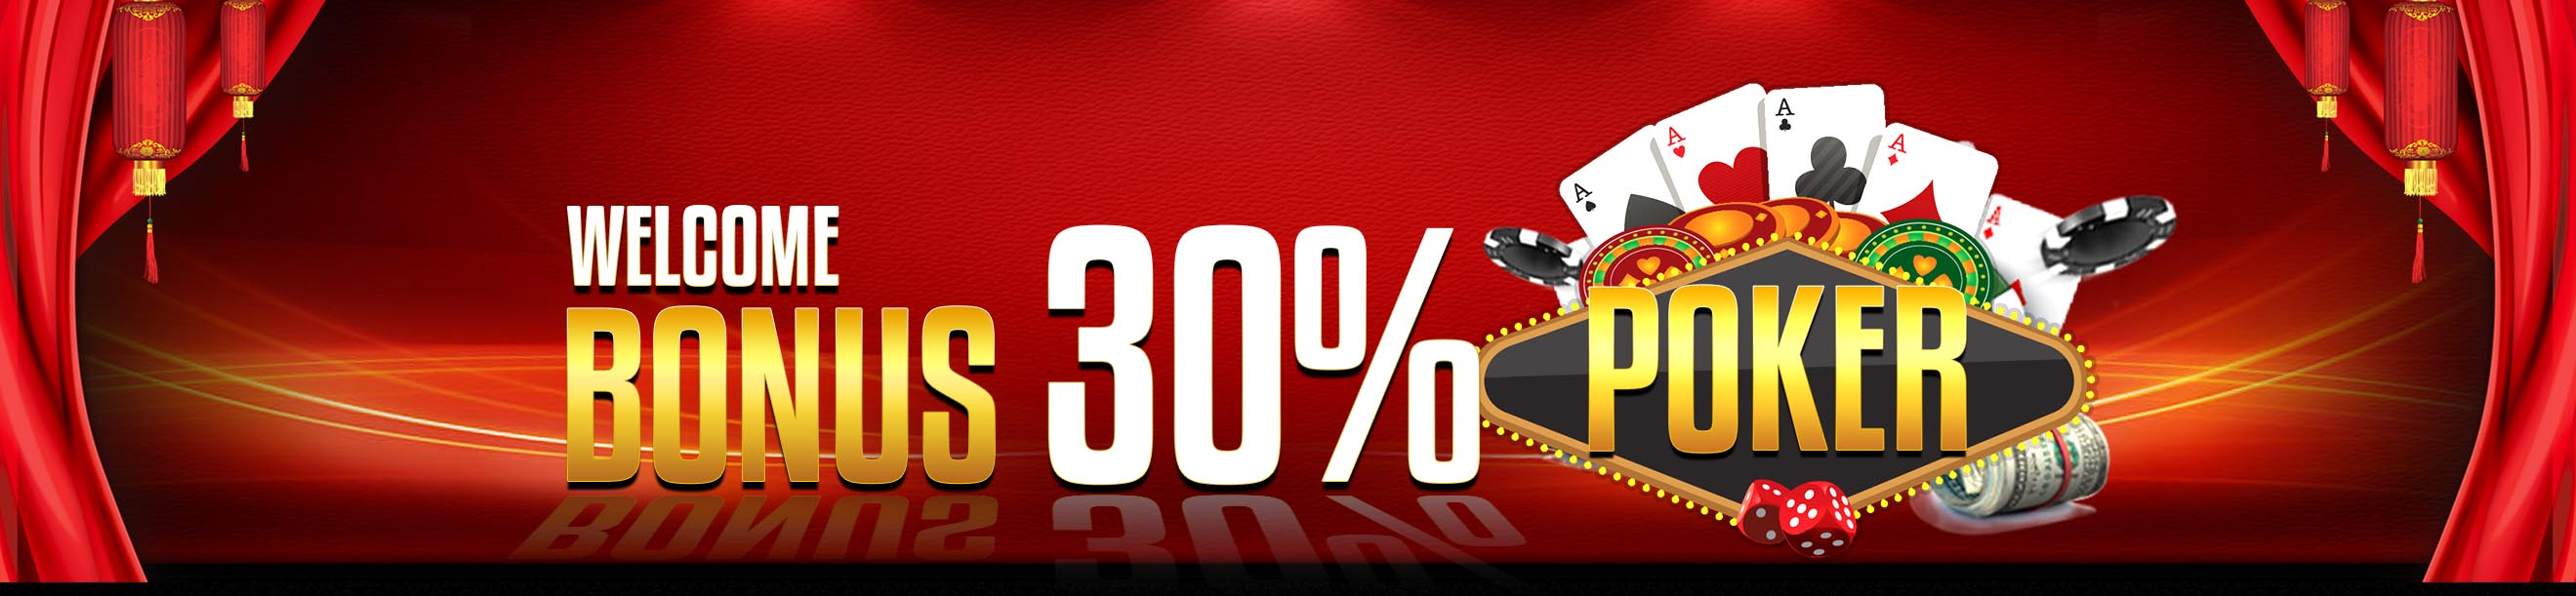 WELCOME BONUS POKER 30%